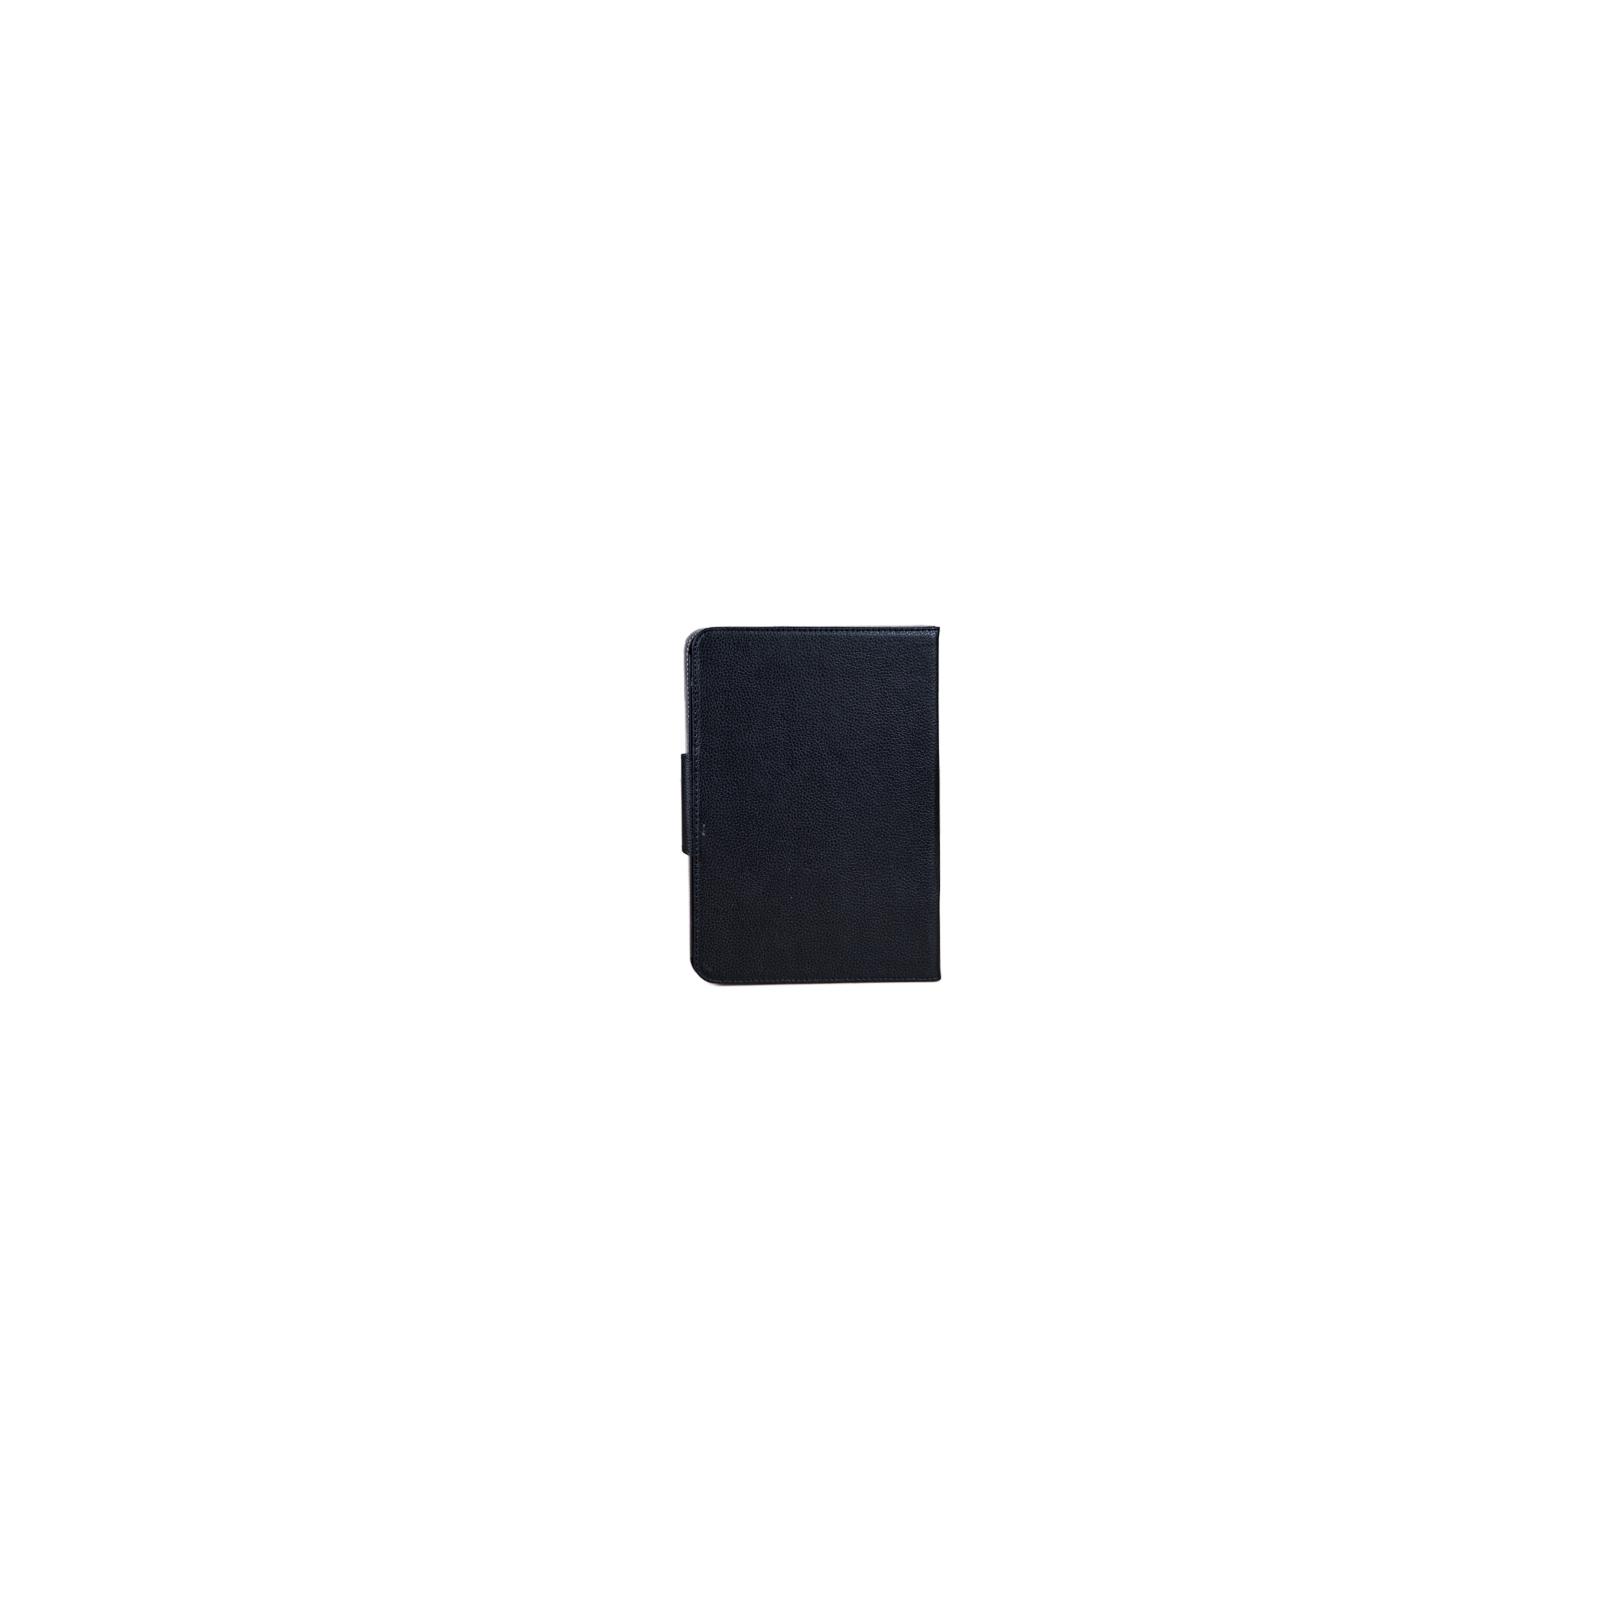 Чехол для планшета Drobak 10.1 Galaxy Tab3 (GT-P5210) Black (216033) изображение 4